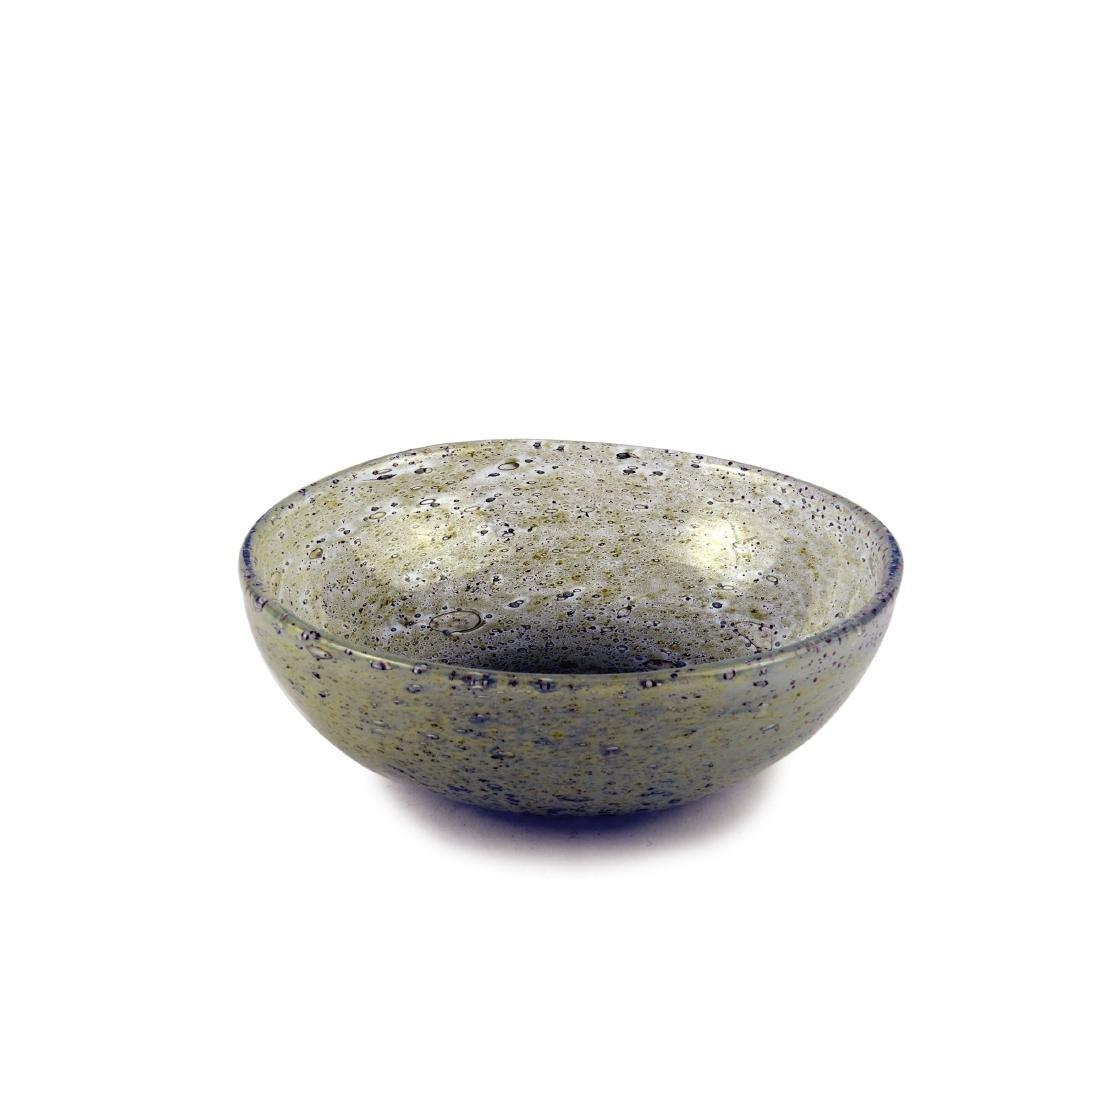 'Aborigeno' bowl, 1954